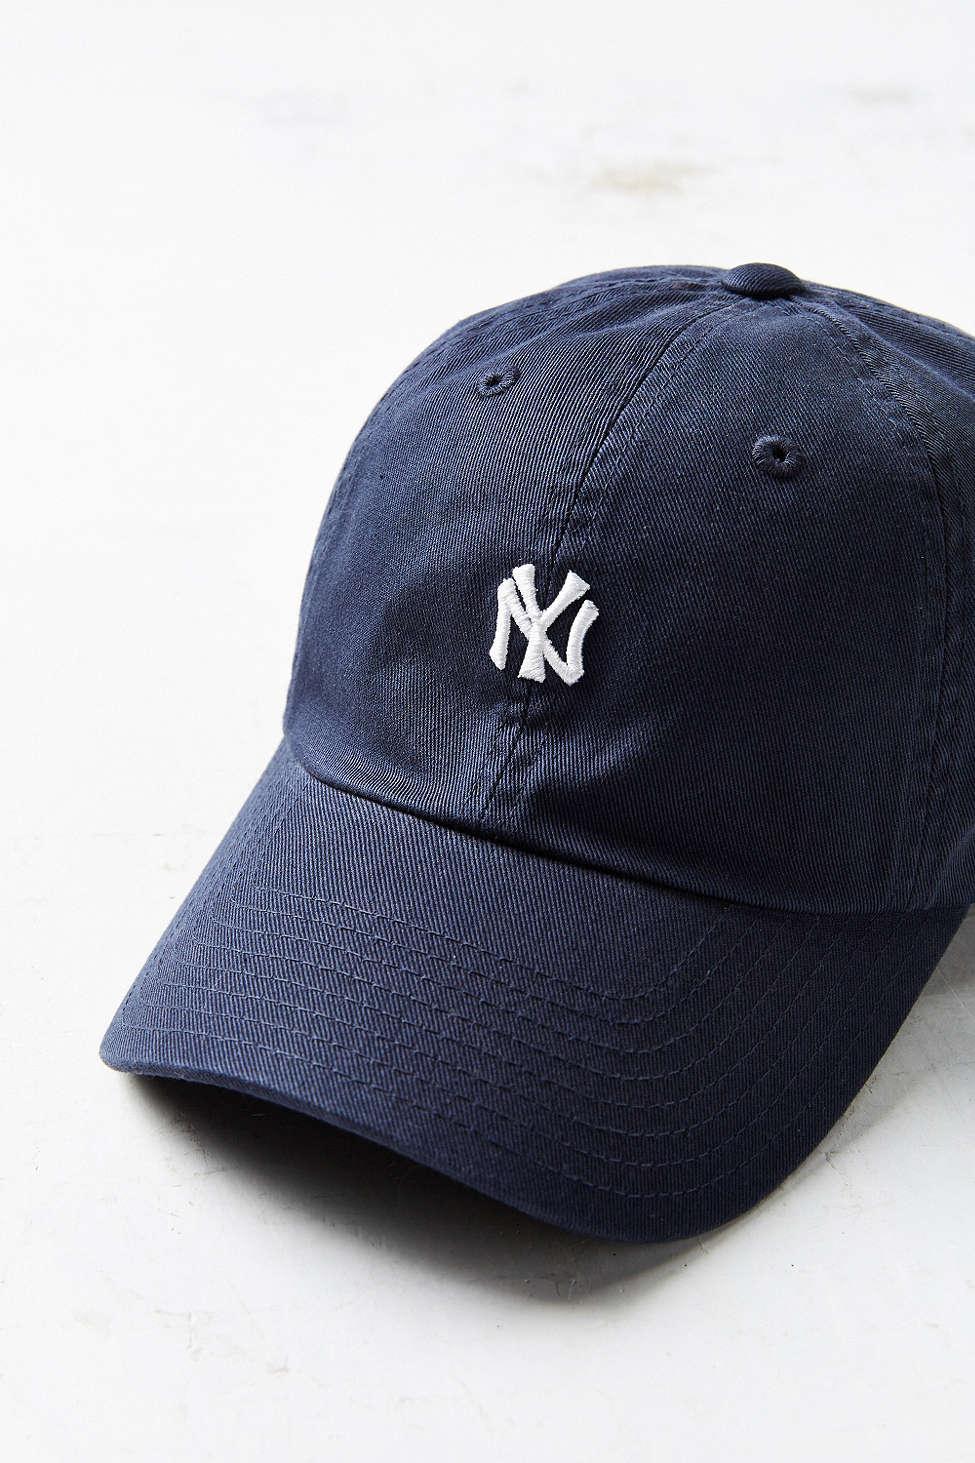 0f7cb6106a2 Lyst - American Needle Classic Micro Ballpark Variant Baseball Hat ...